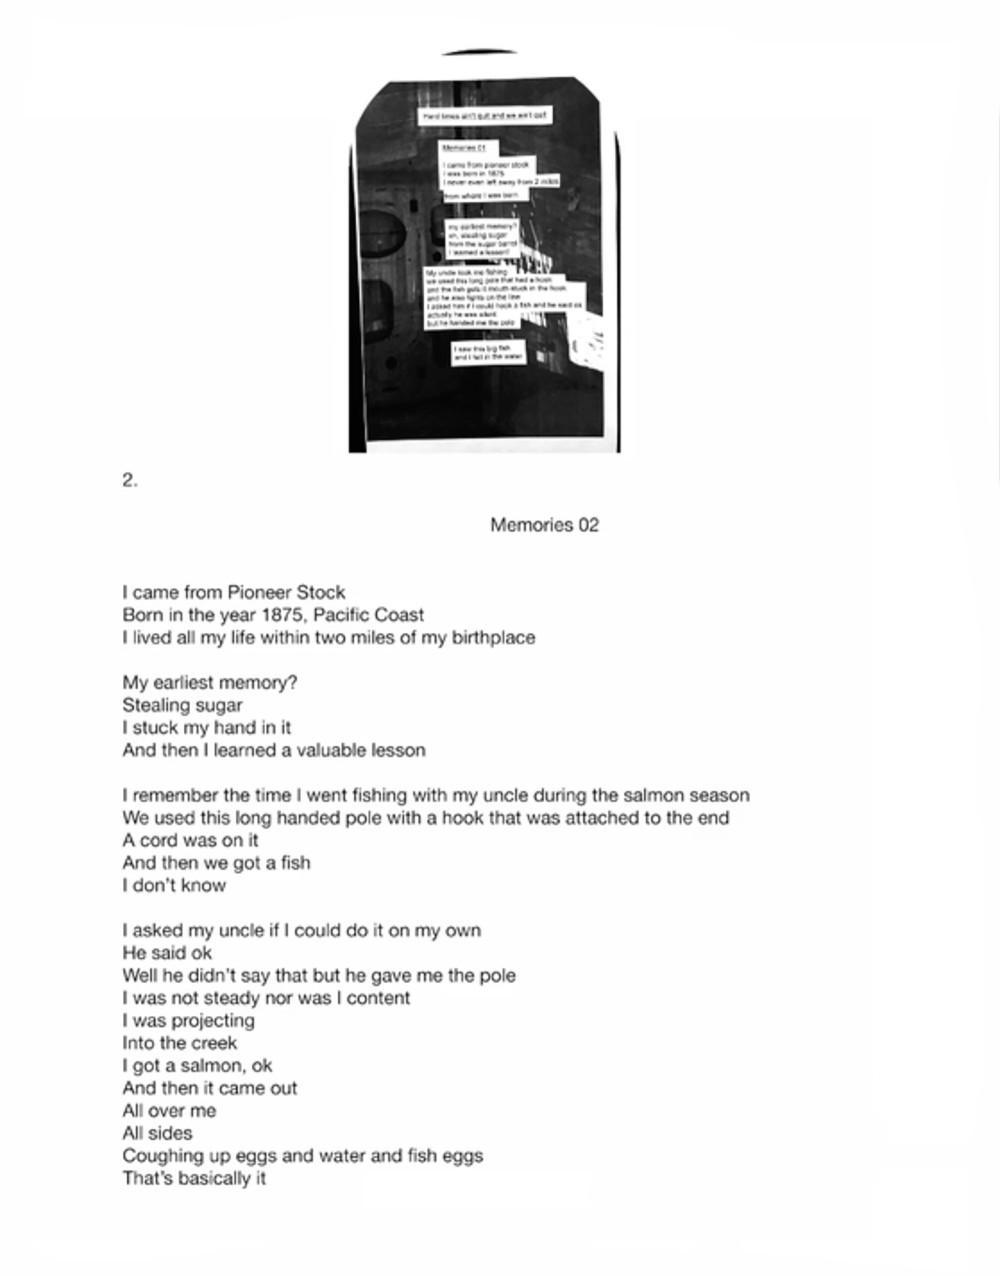 Megan Plunkett Memories 01 - 02 (Still), 2015 Video 7m52s looped, projector, extension cord, plywood